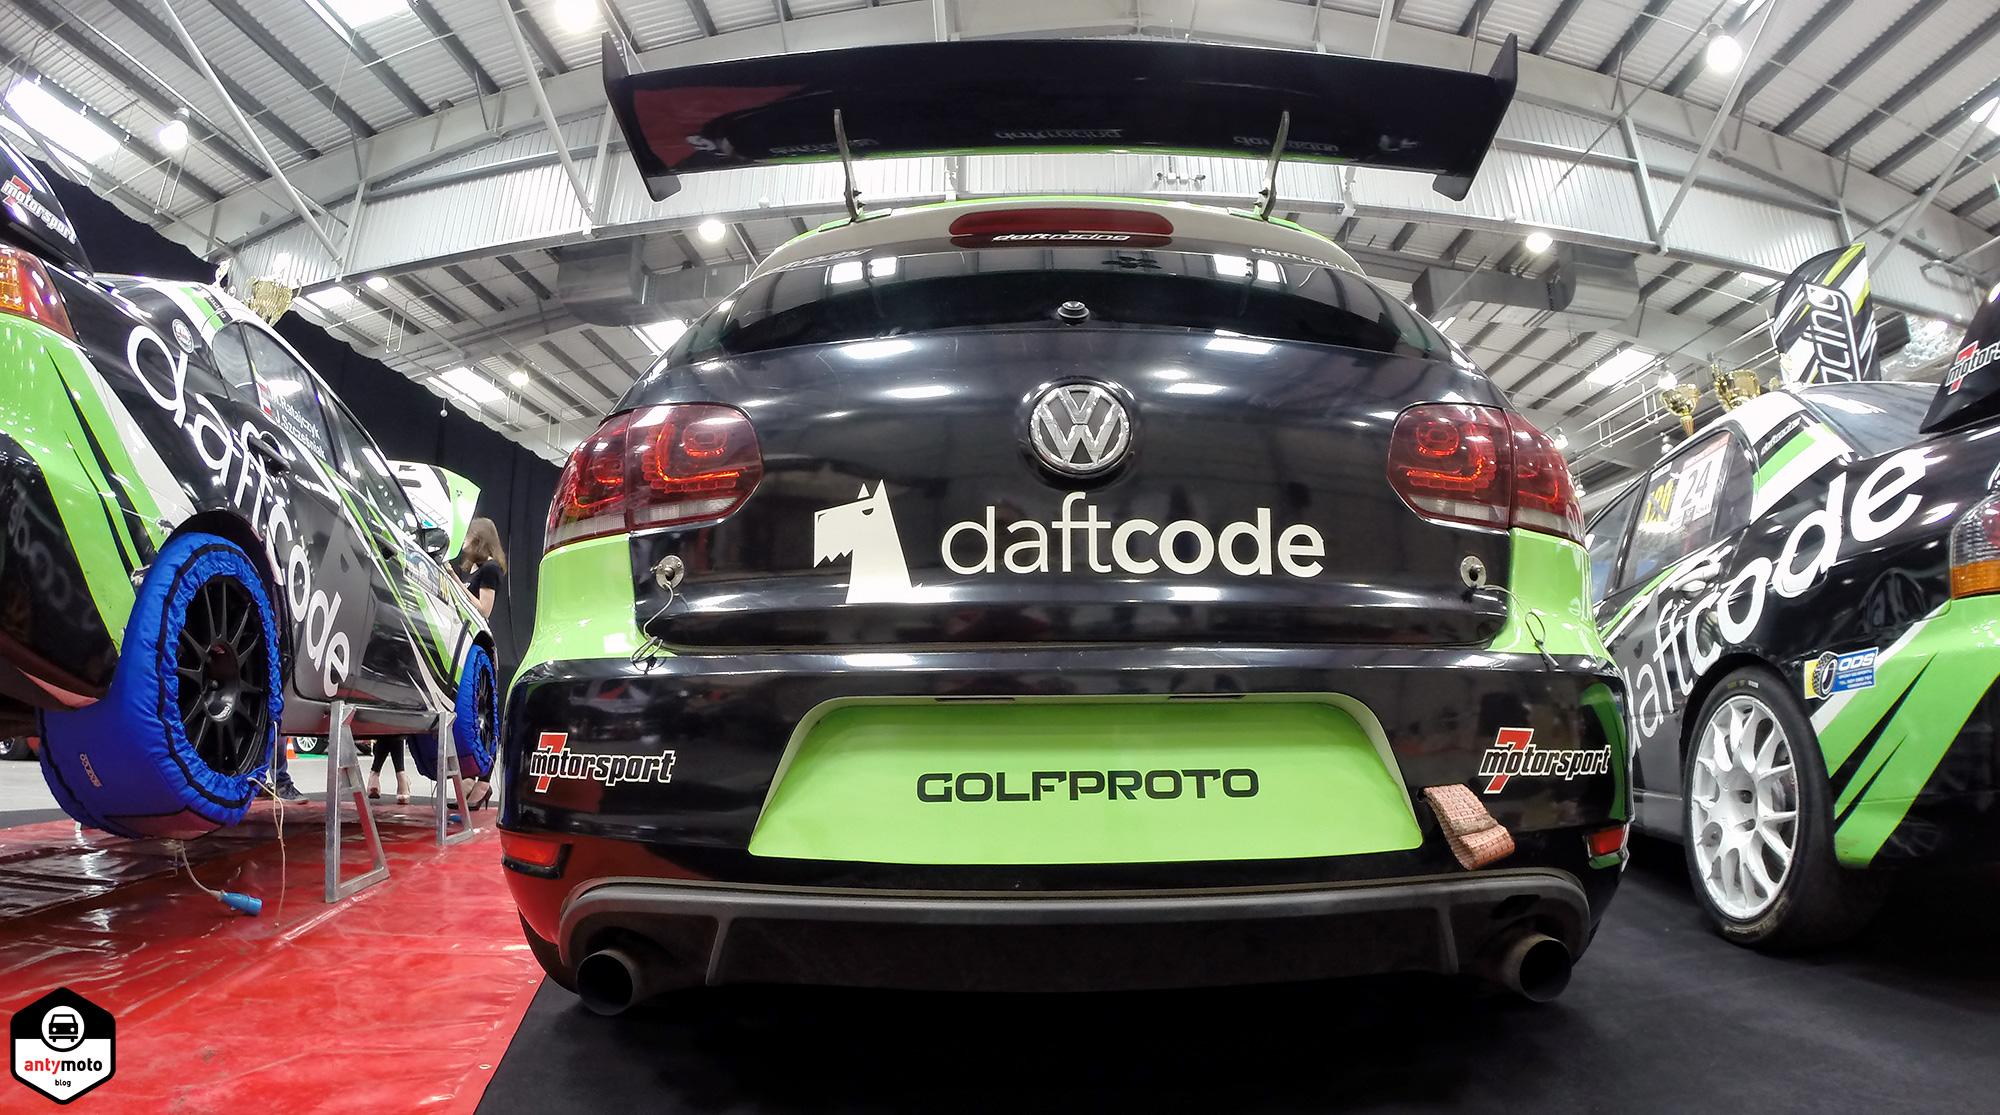 golf_daftcode